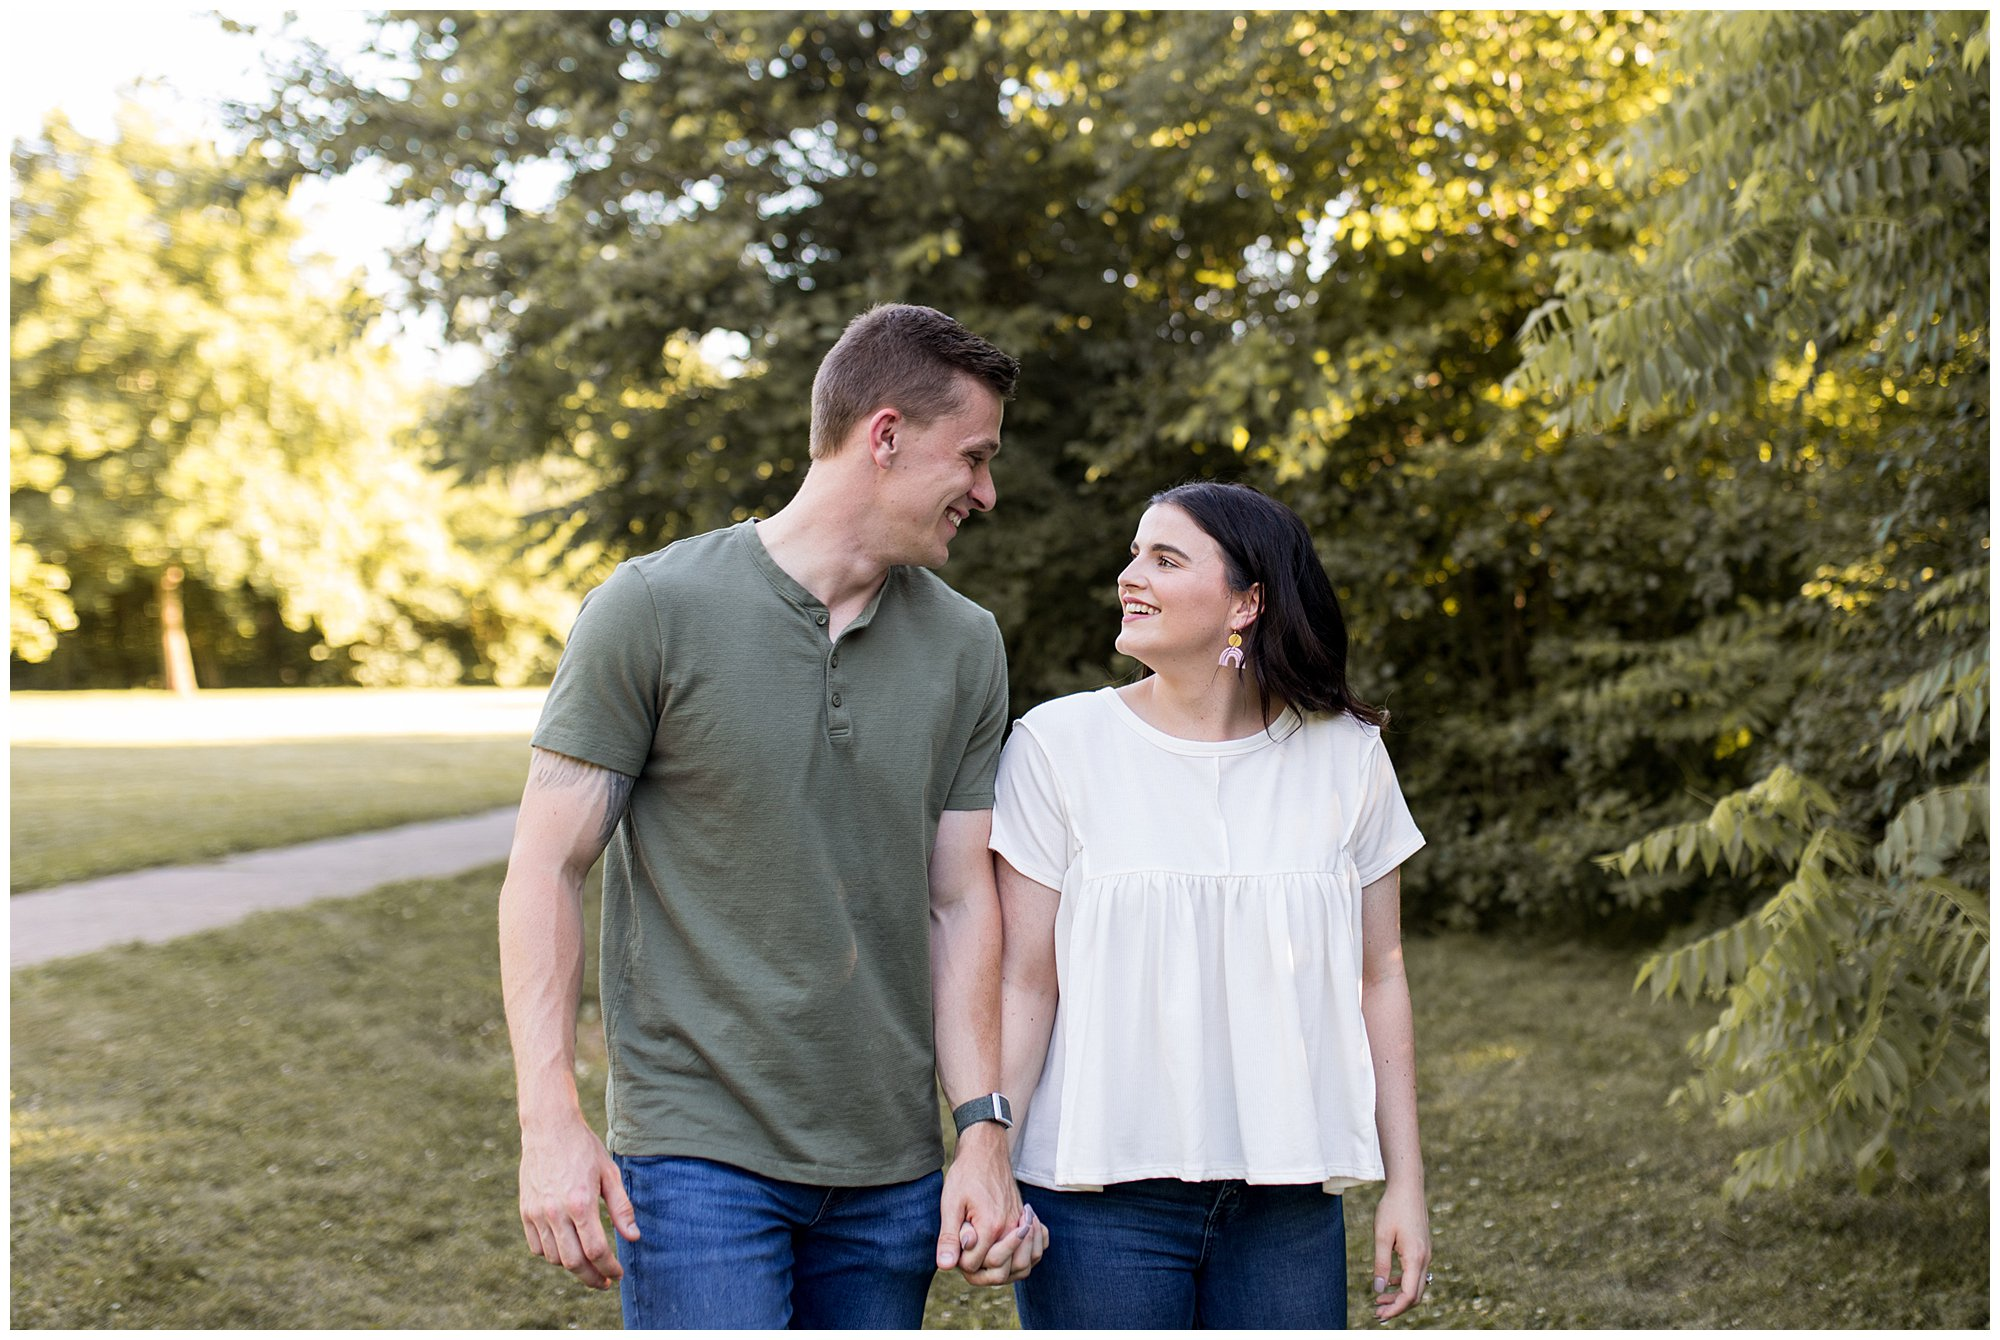 summer engagement at Potter's Bridge Park in Noblesville Indiana